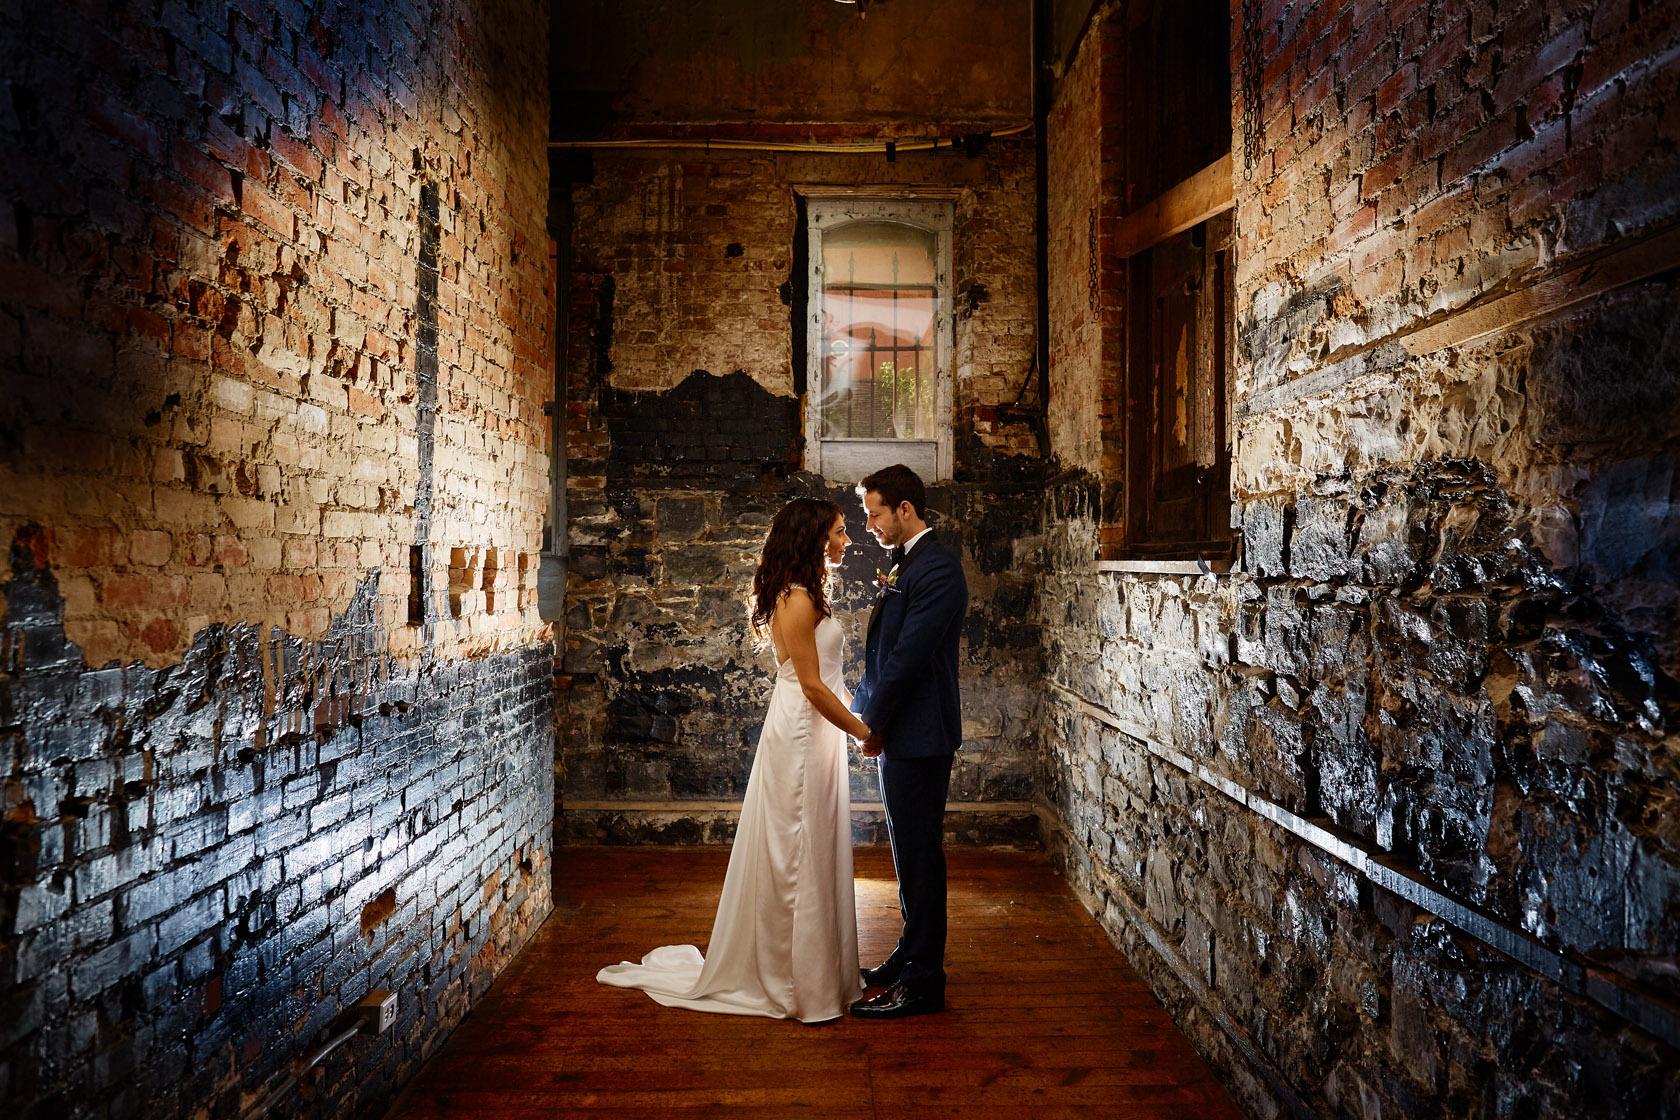 stephen sager photography 2193 toronto wedding photography